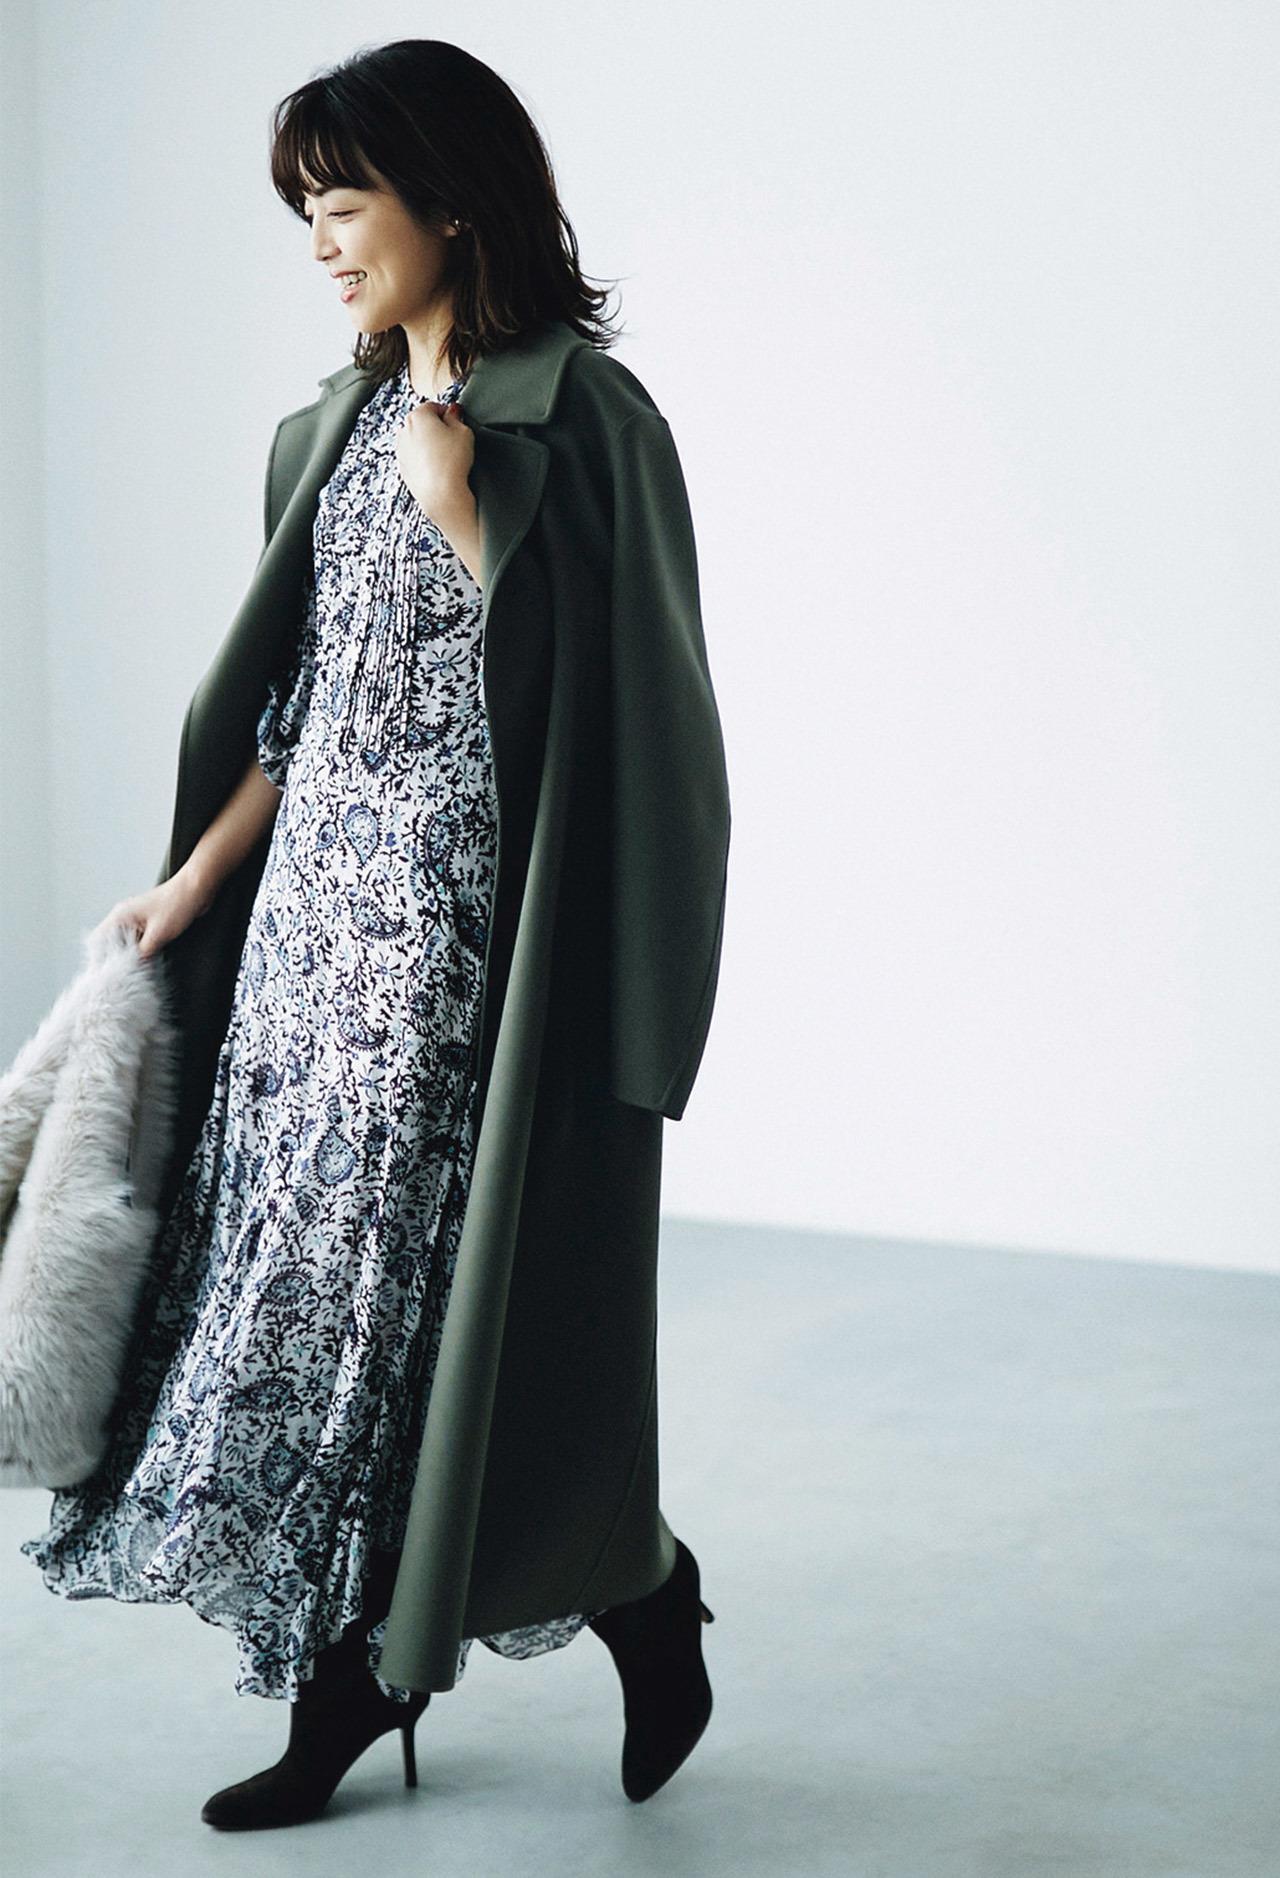 ISABEL MARANT ÉTOILEのプリントワンピースと Anita Bilardiのファーバッグを着用